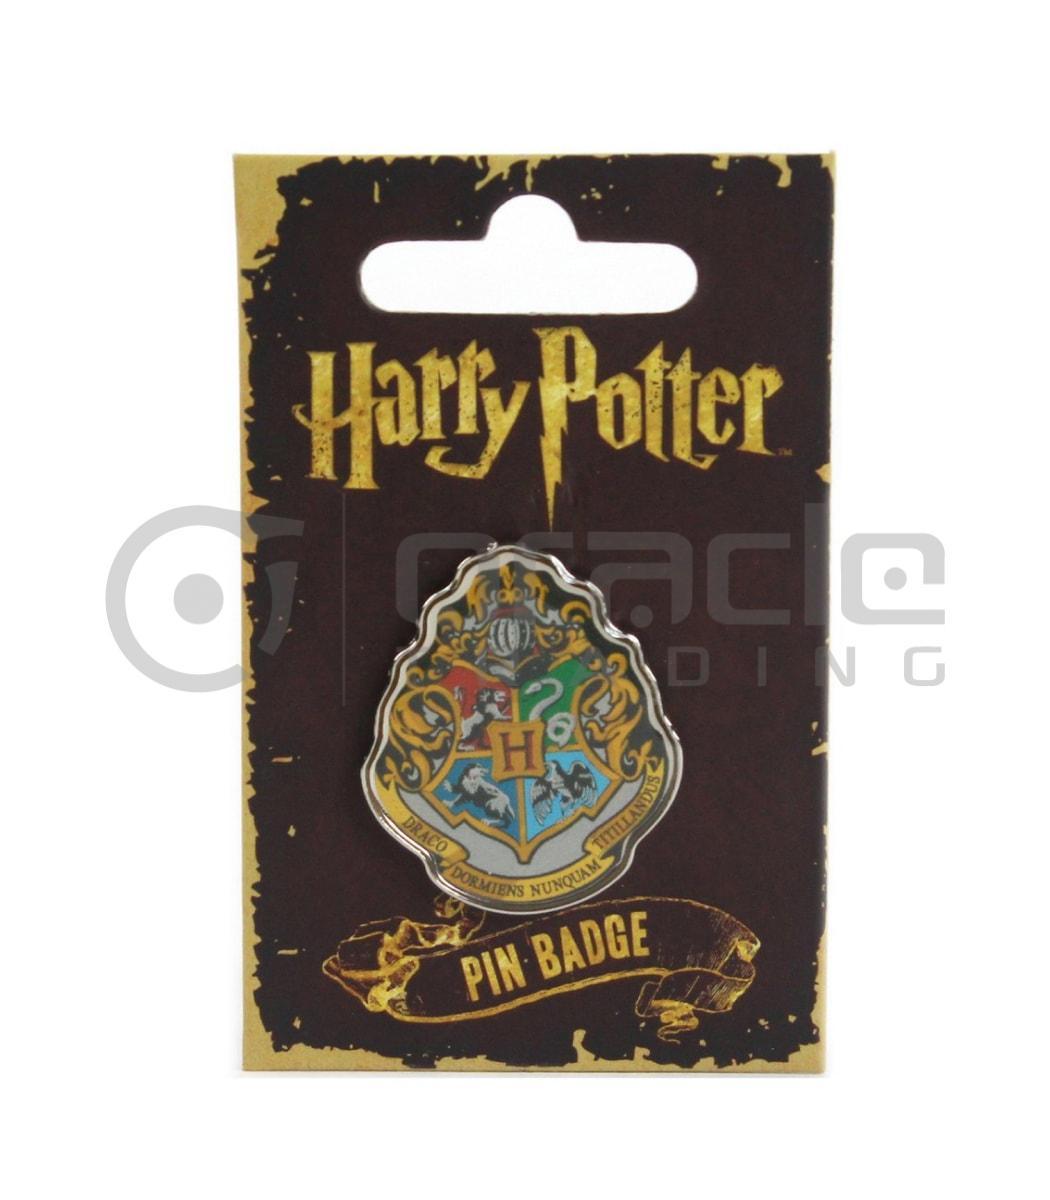 Harry Potter Pin Badge - Hogwarts